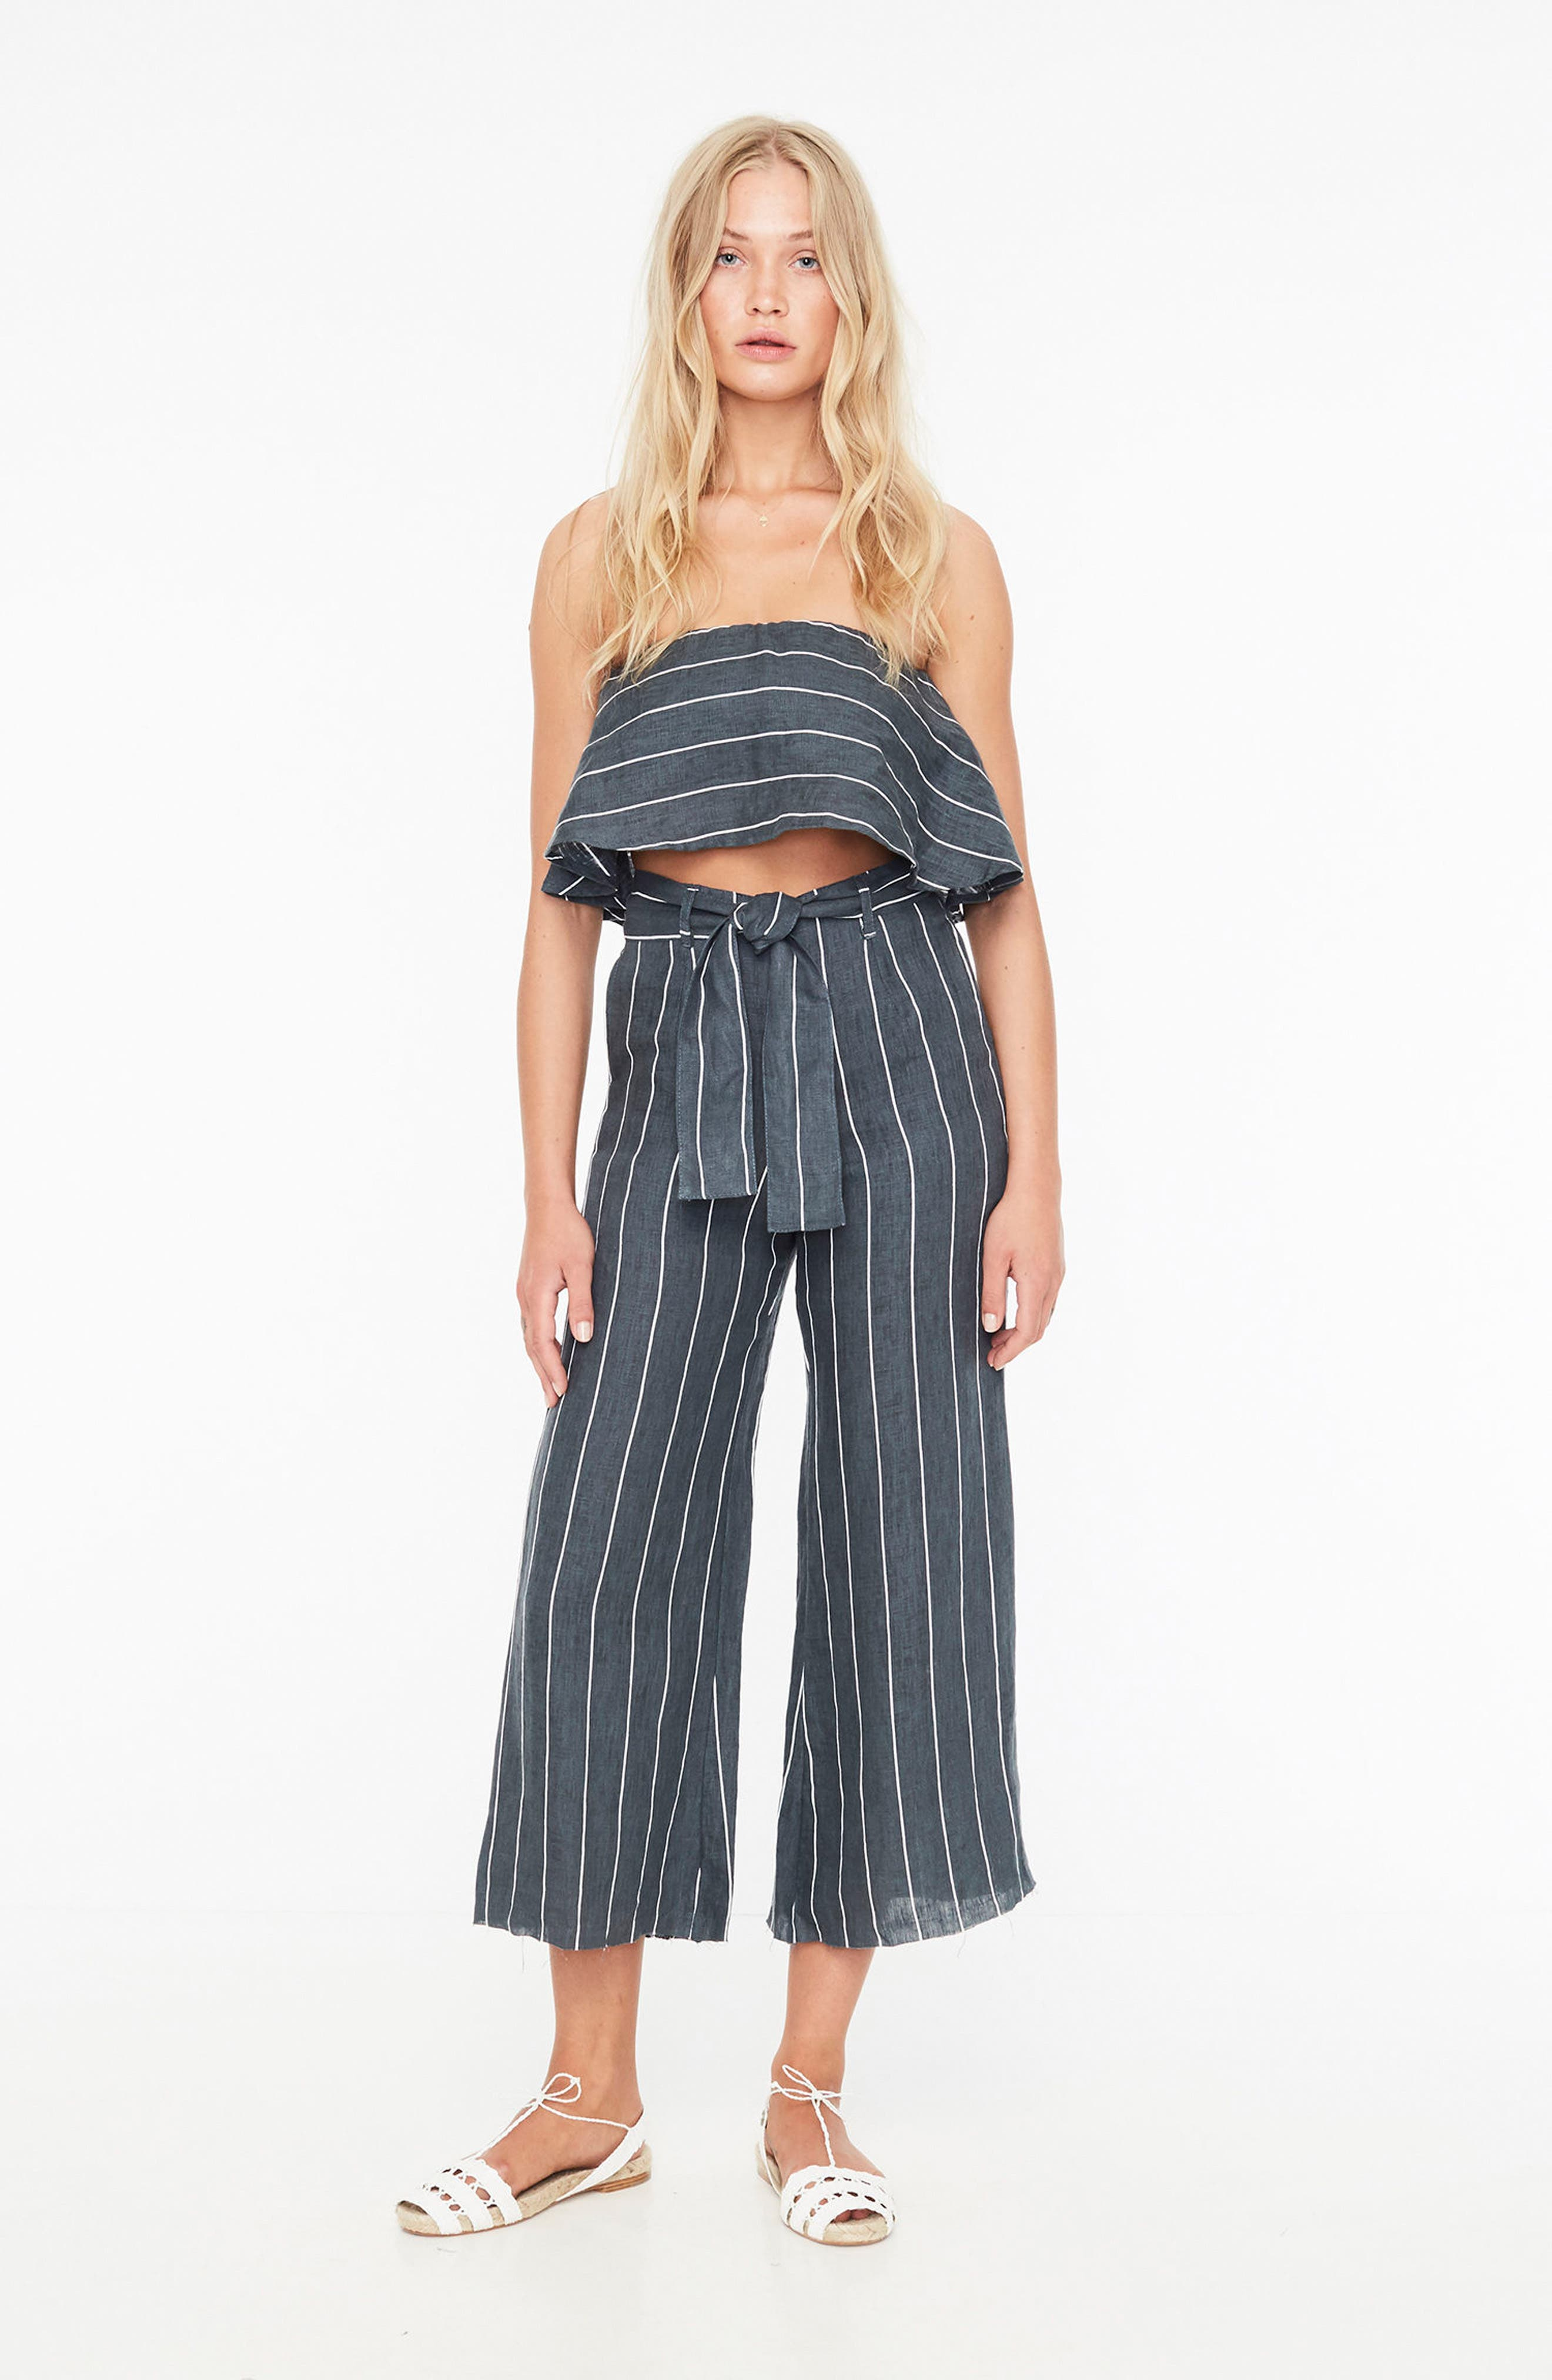 Solana Stripe Strapless Linen Crop Top,                             Alternate thumbnail 10, color,                             700